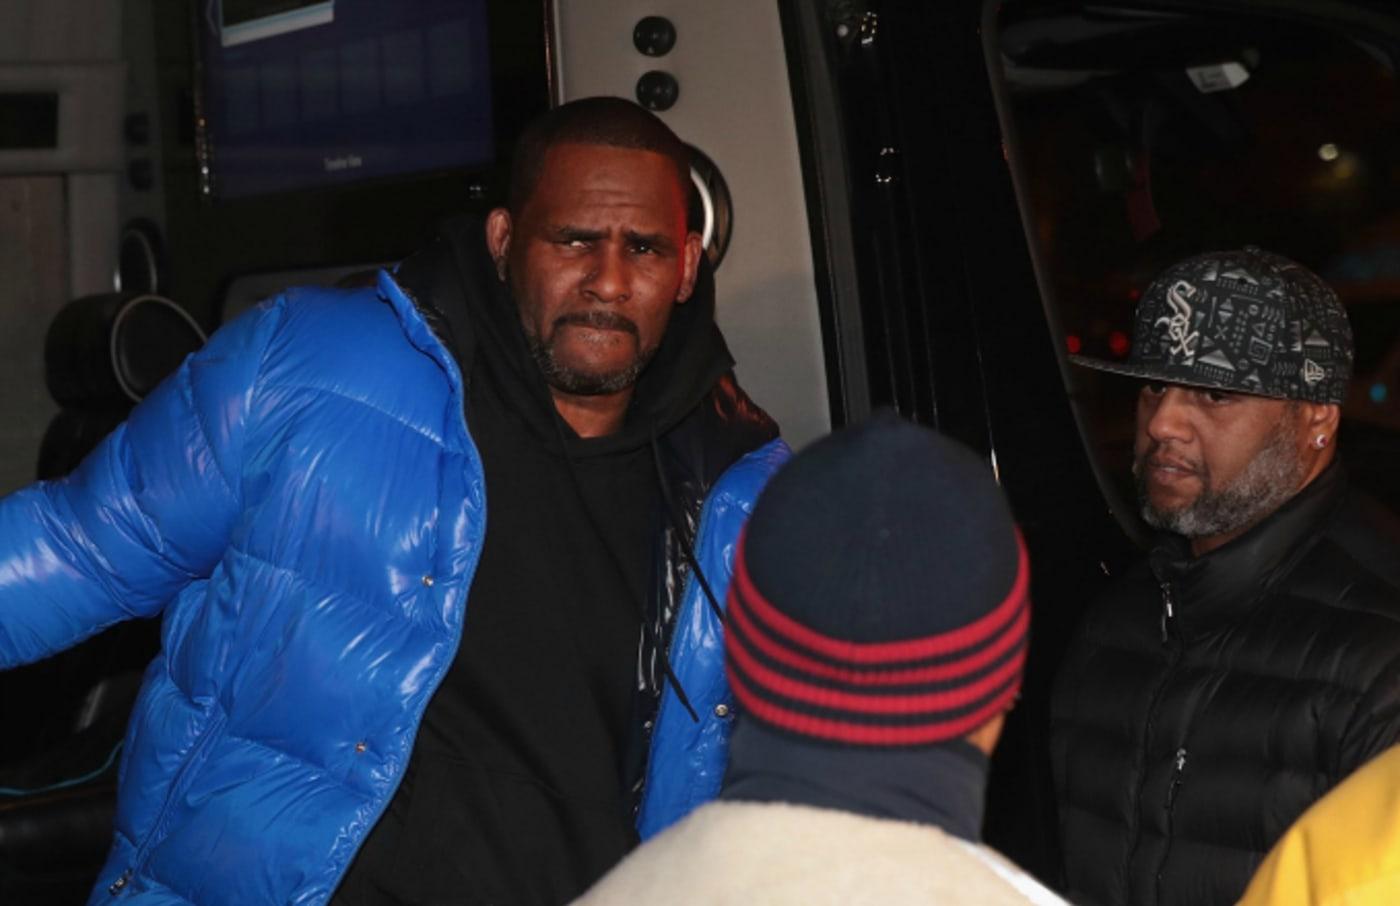 R&B singer R. Kelly arrives at the 1st District Central police station